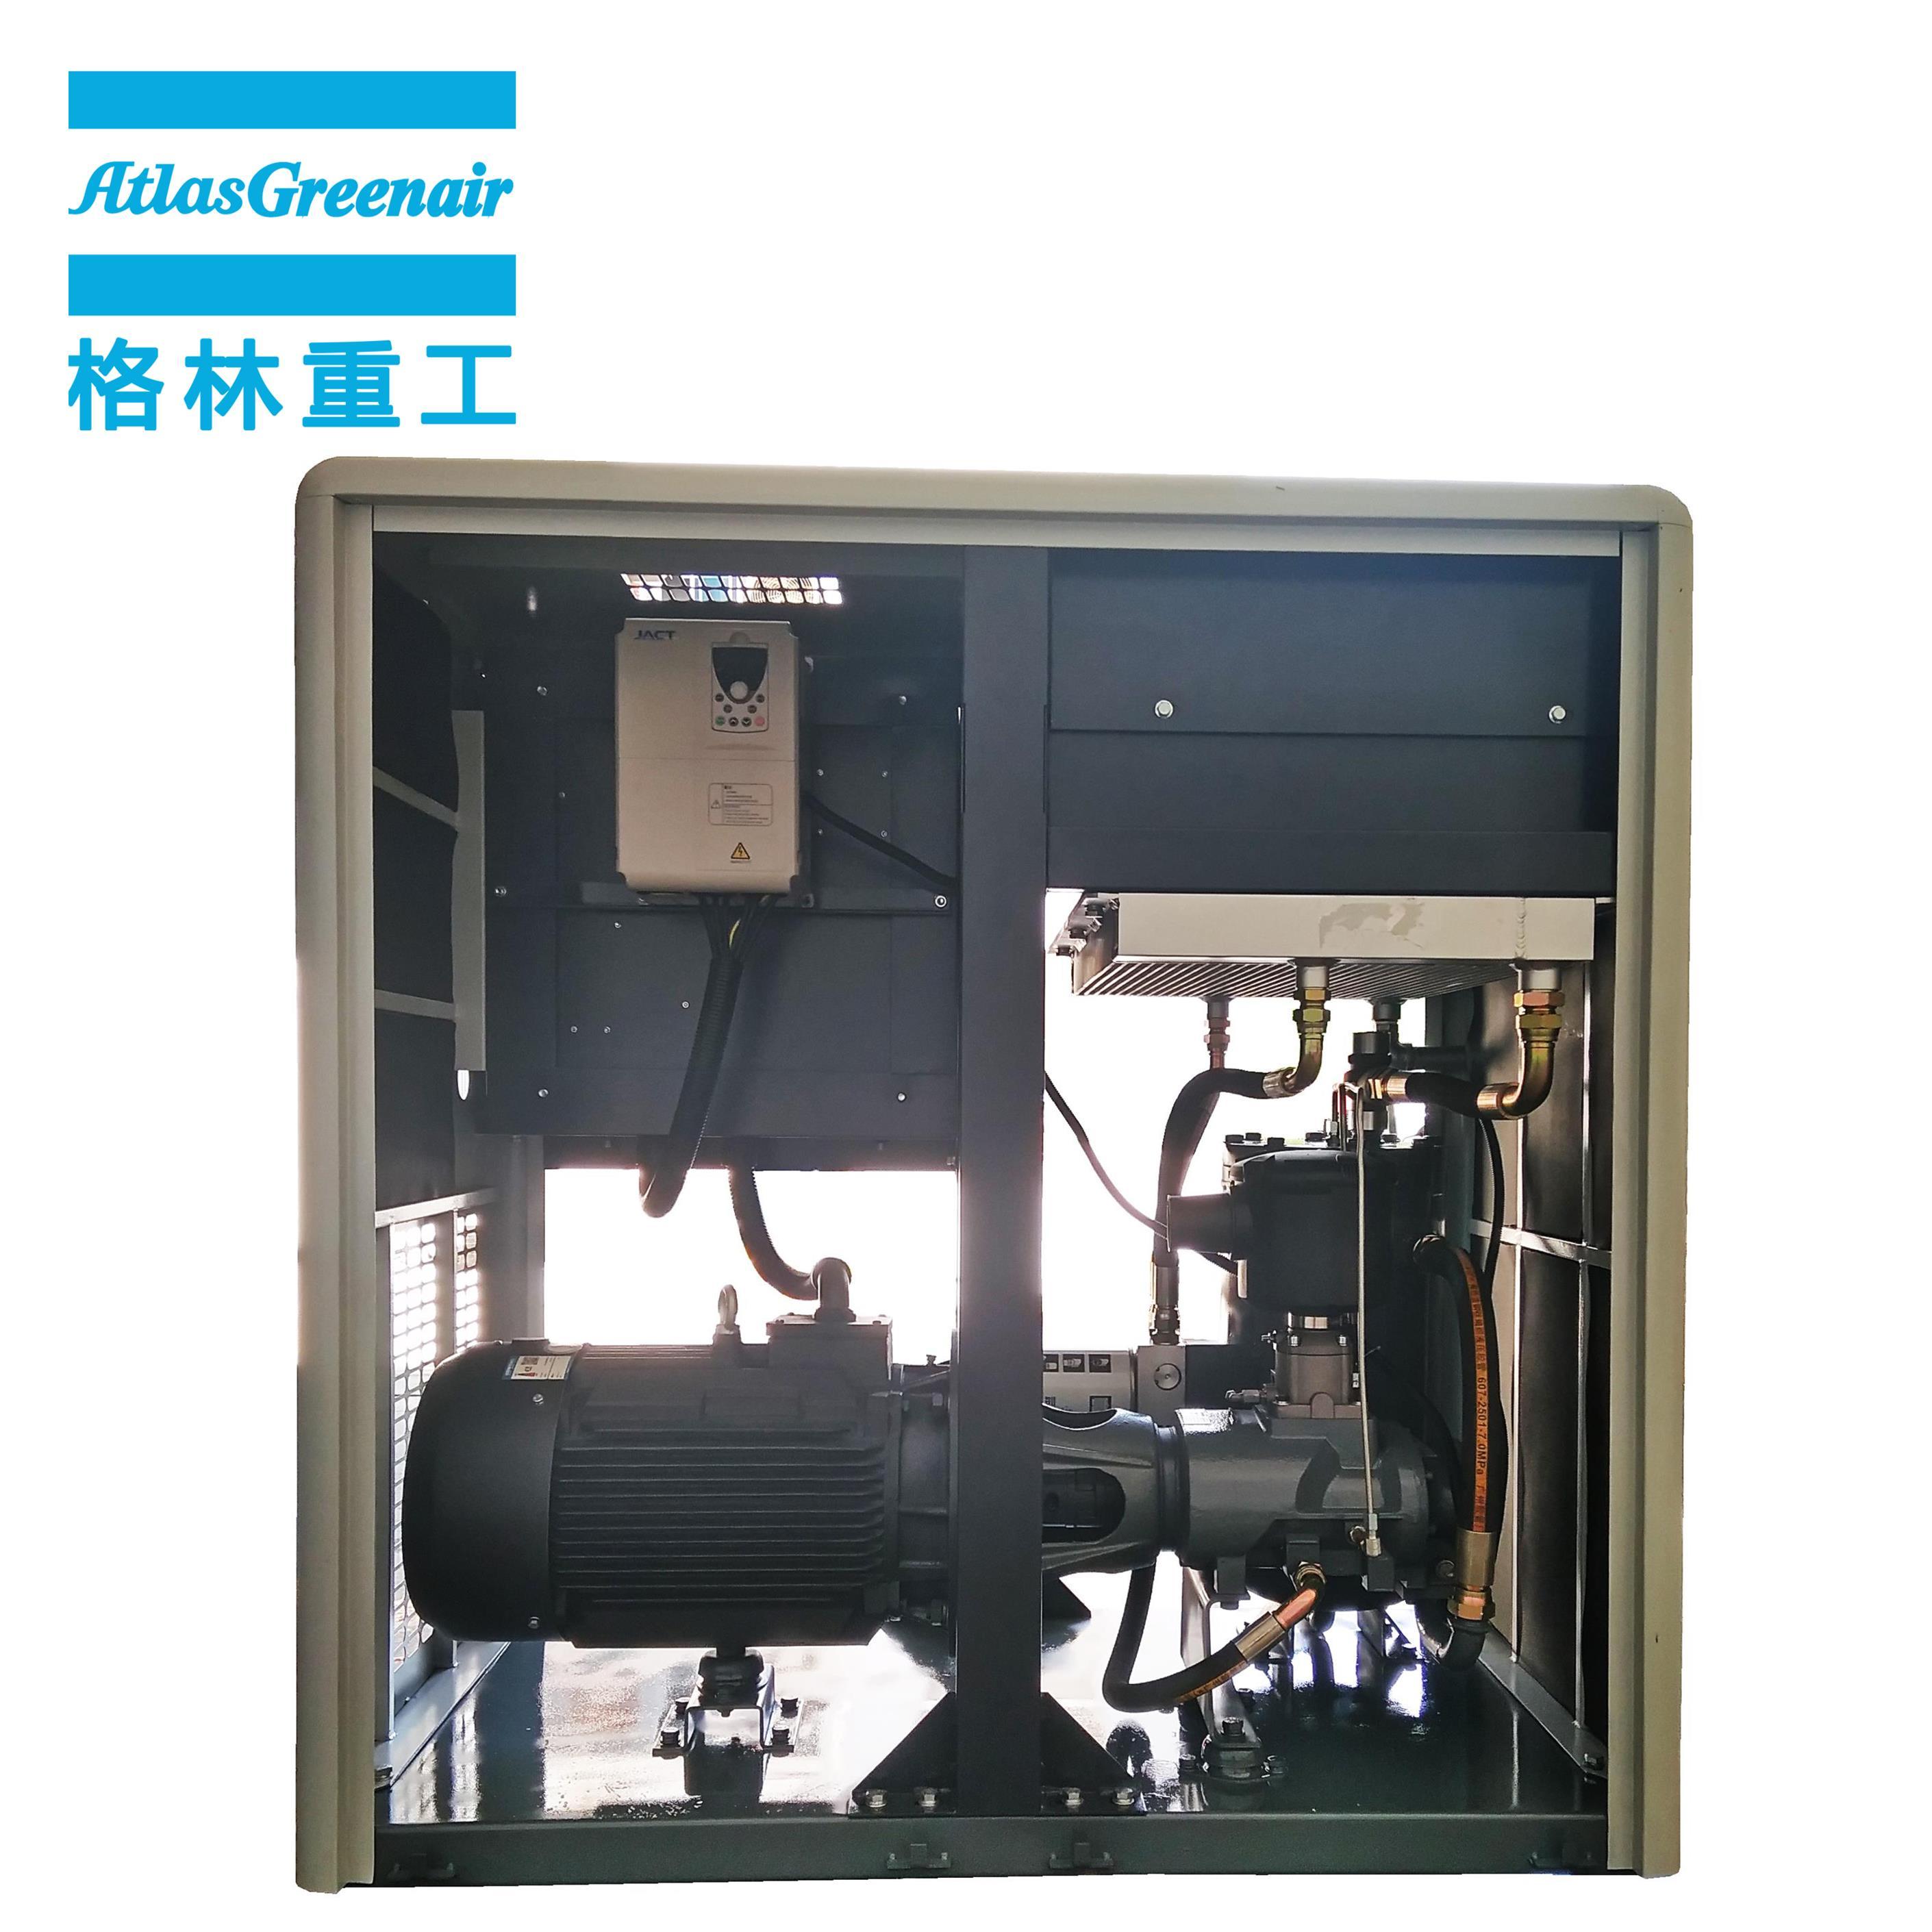 Atlas Greenair Screw Air Compressor variable speed air compressor with a single air compressor for sale-2